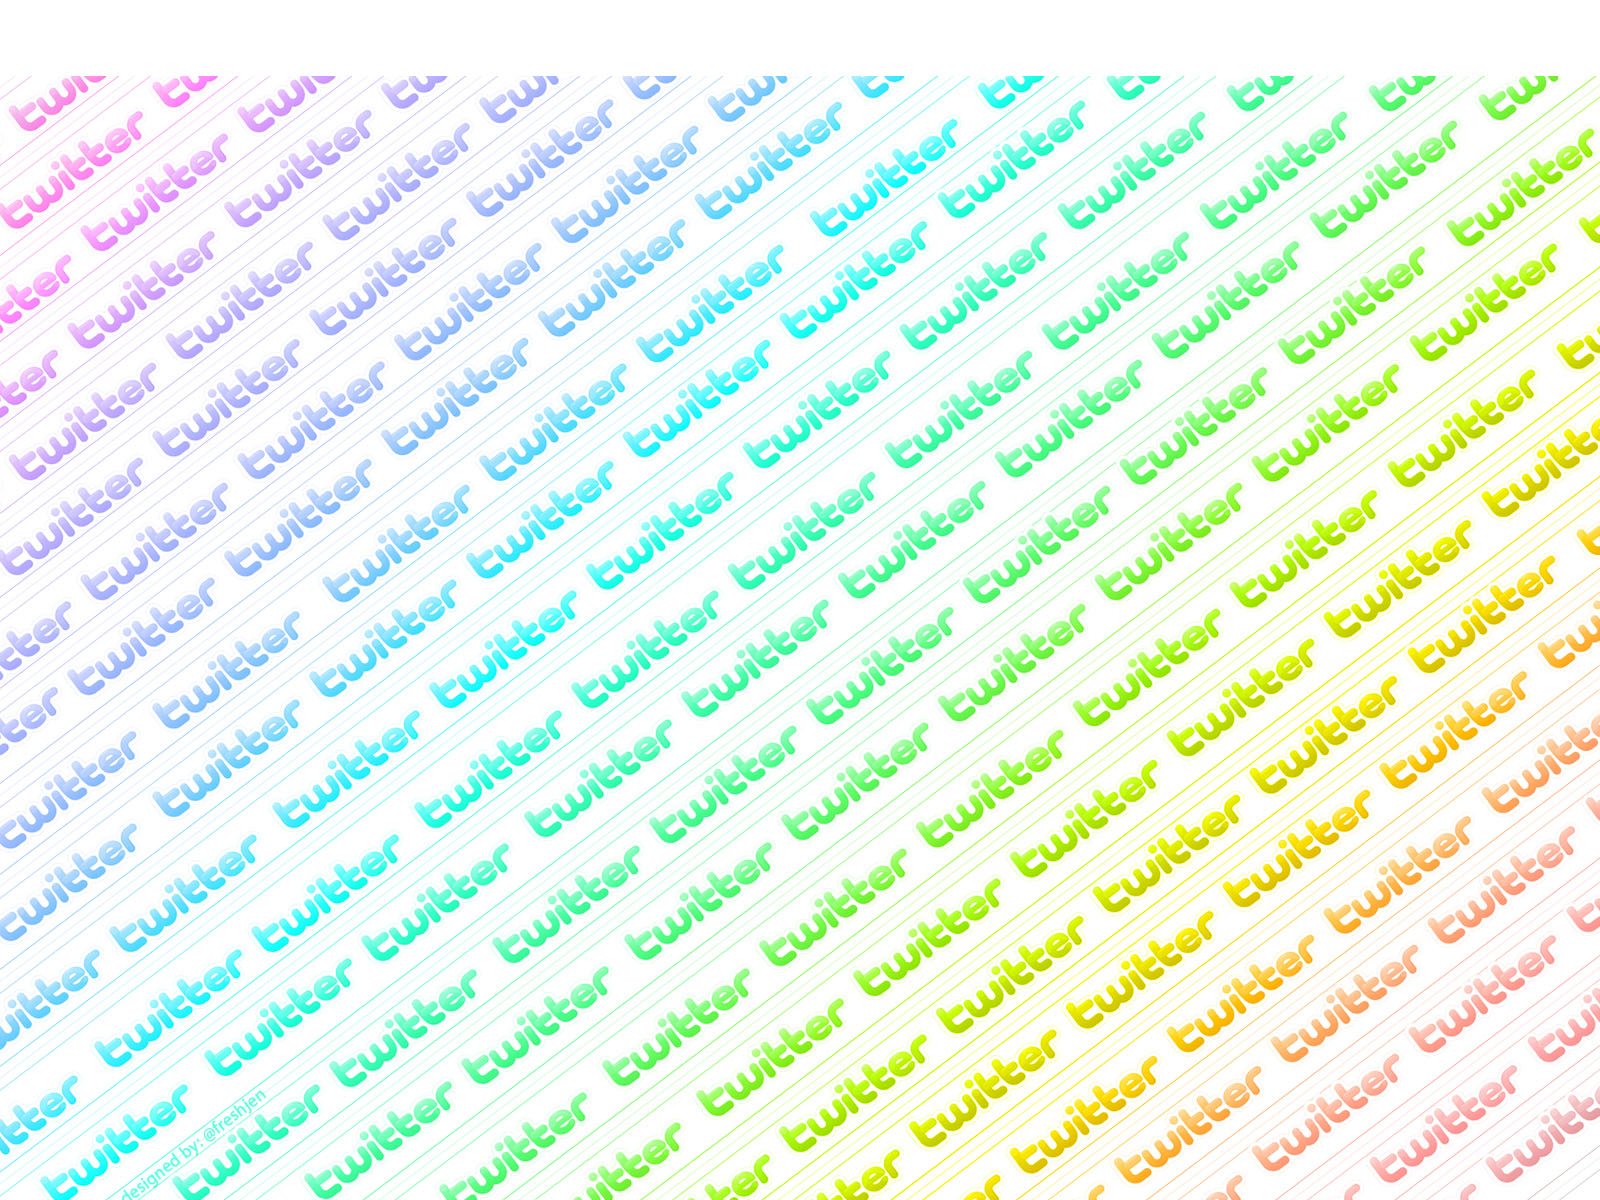 Cute Wallpapers For Blackberry Curve 8520 Famous Leuke Achtergronden Teksten